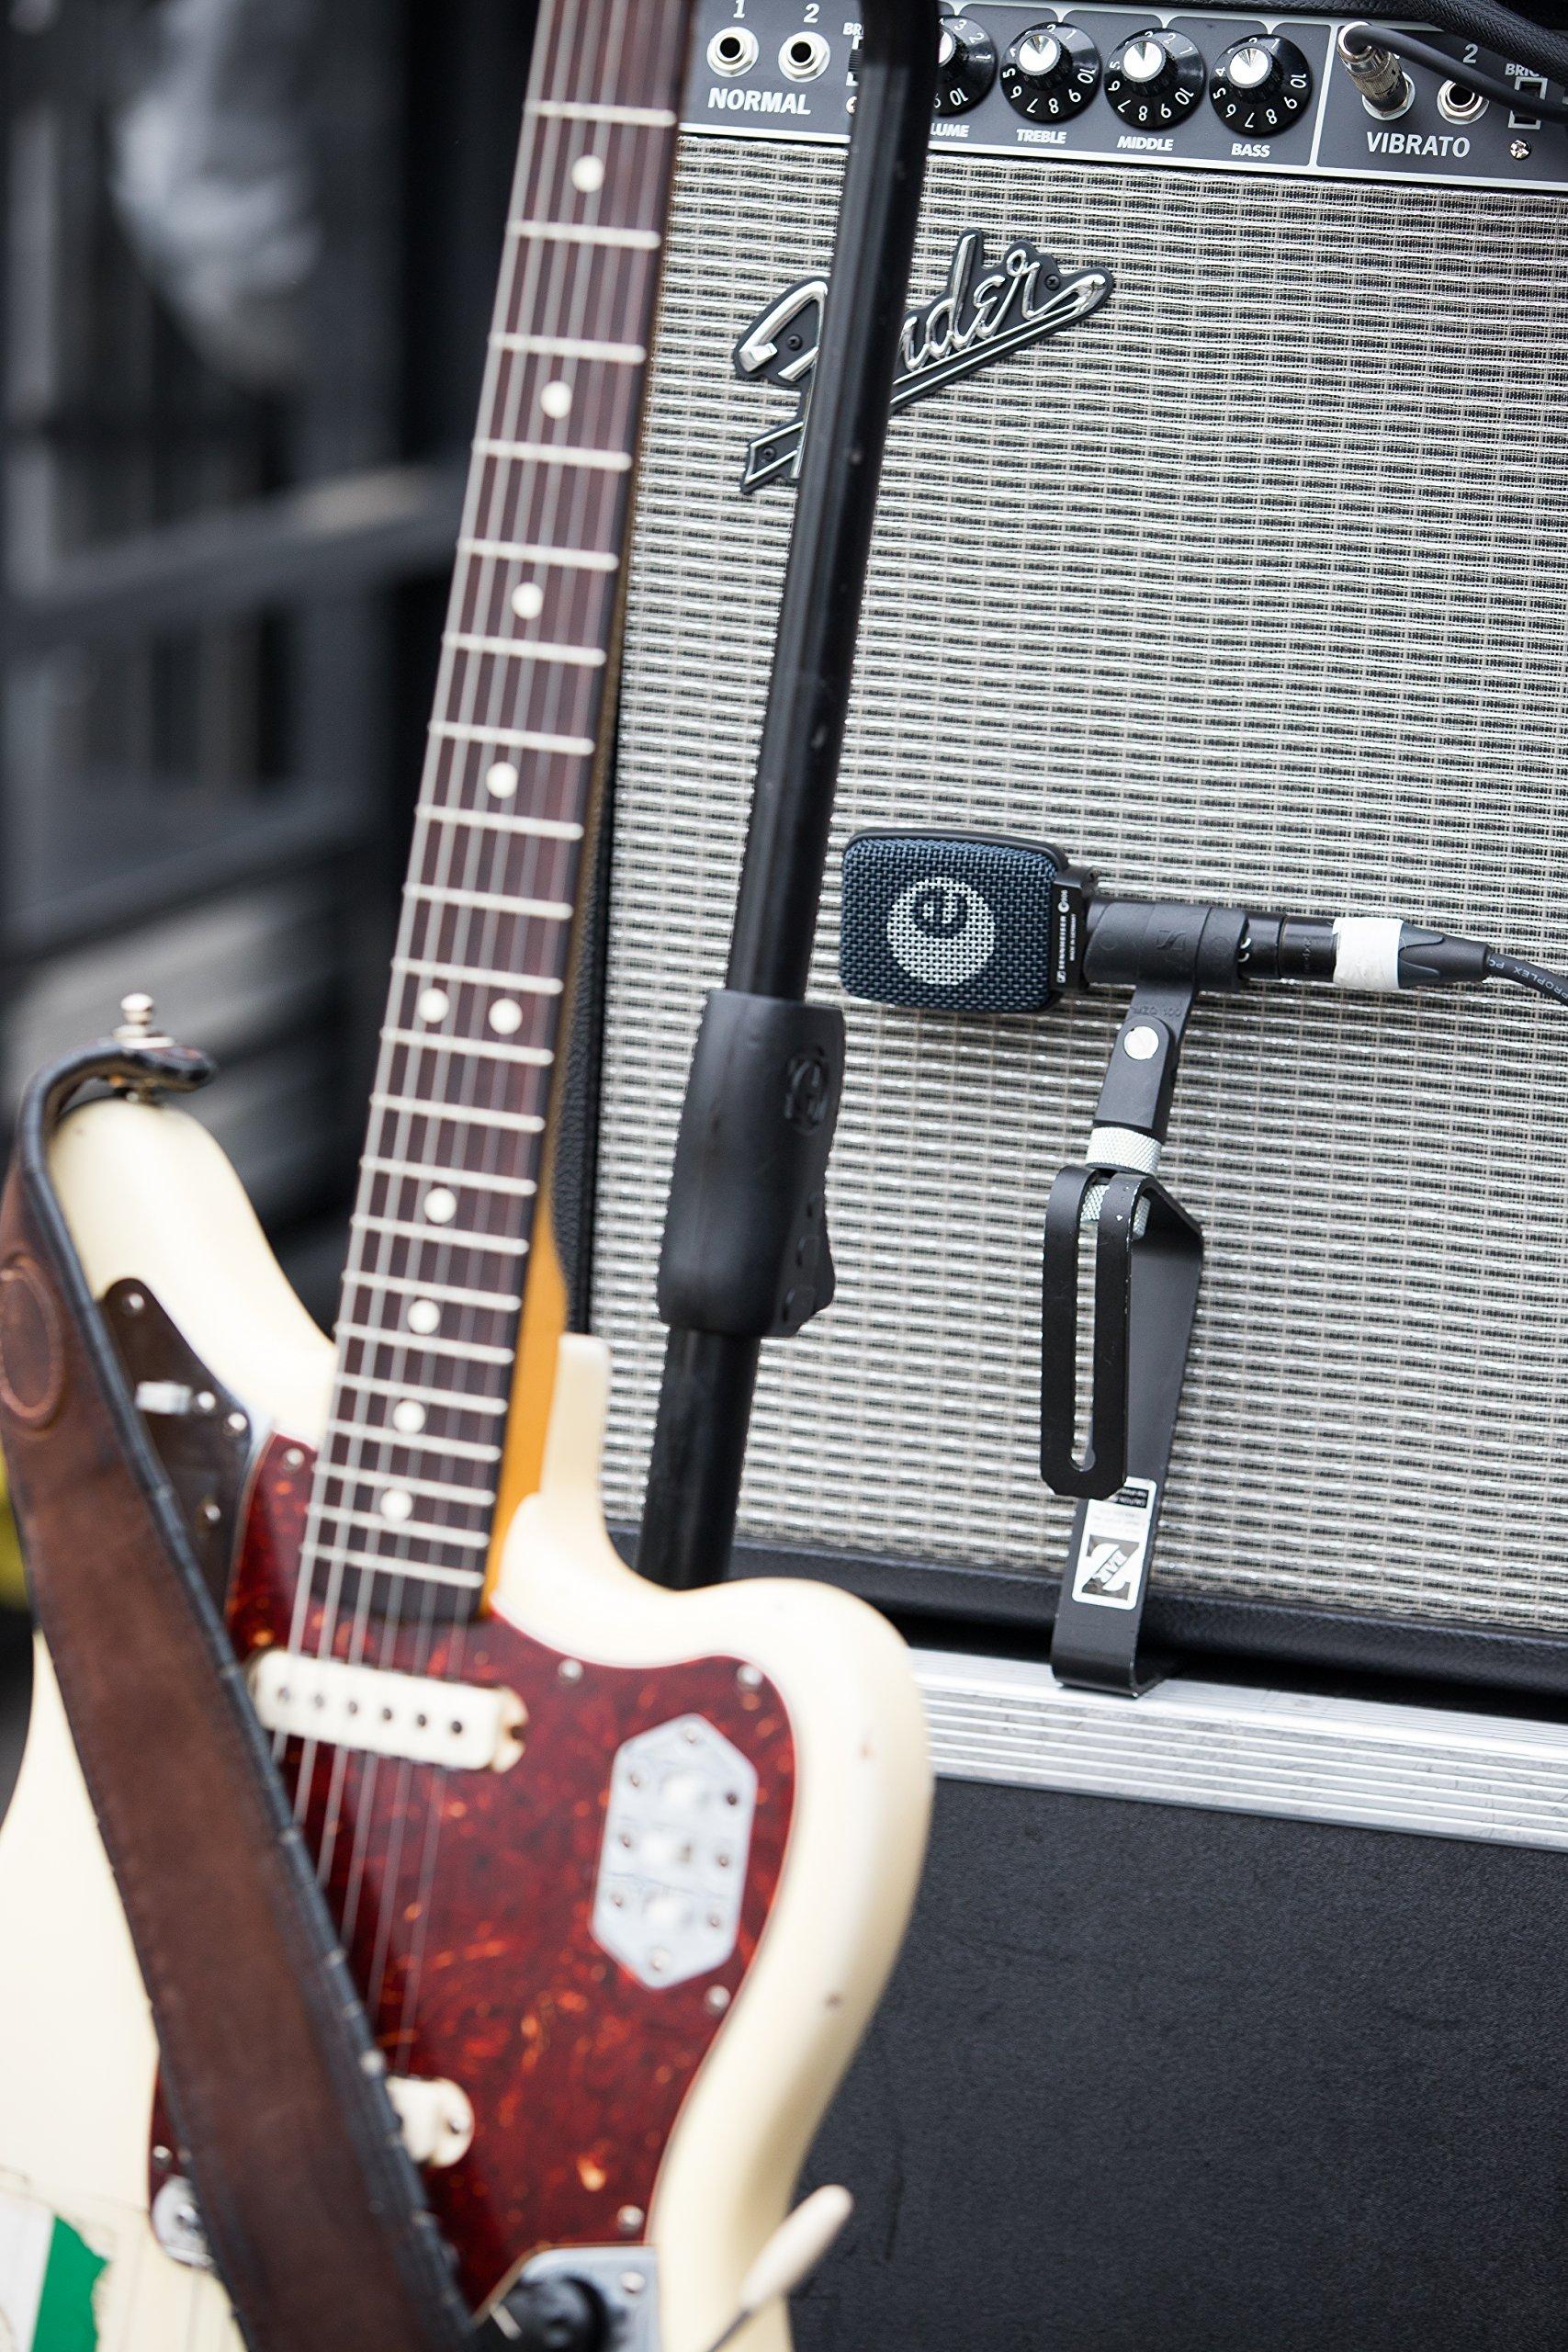 Sennheiser e906 Supercardioid Dynamic Mic for Guitar Amps by Sennheiser Pro Audio